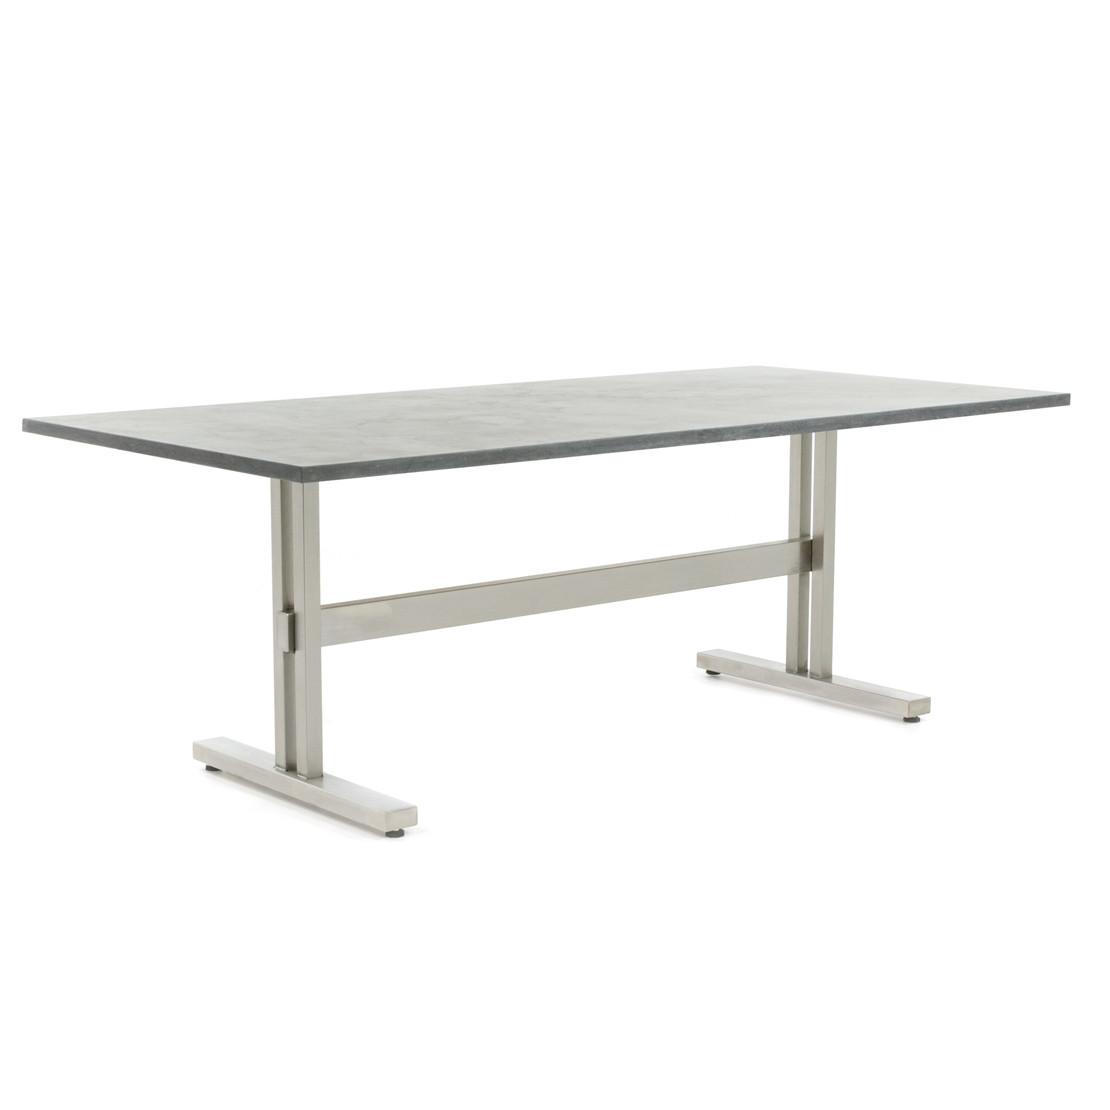 Edelstahl Tischgestell Trento mit Tropical Brown Granitplatte